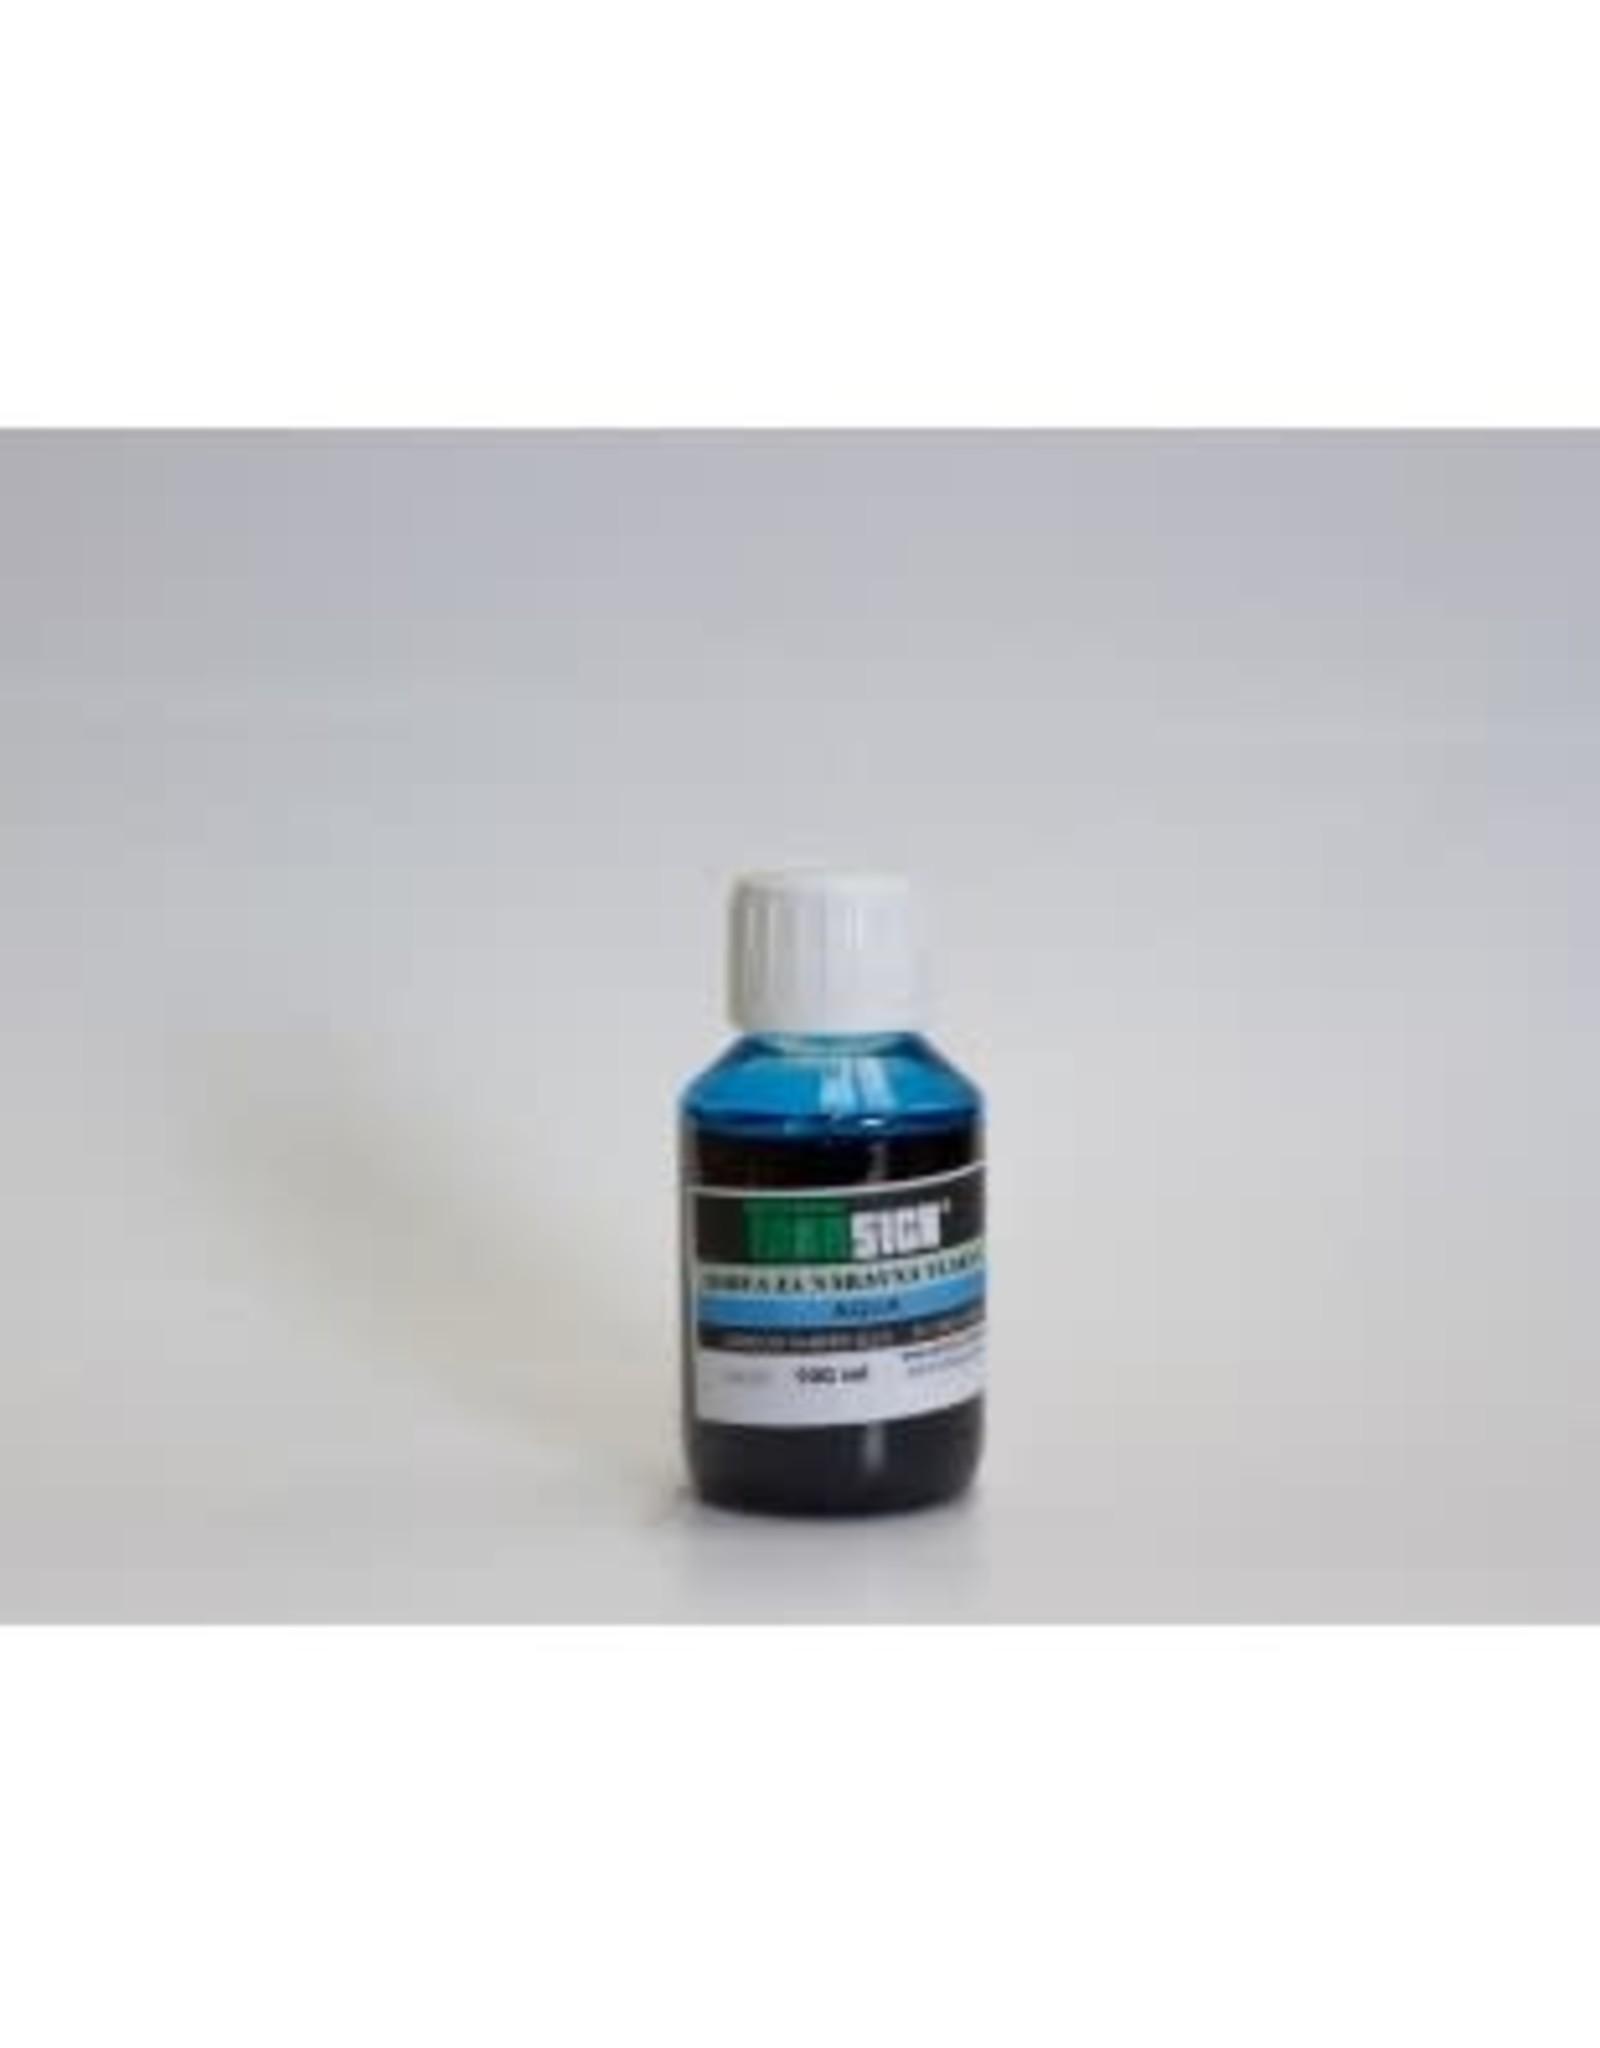 Tobasign Turquoise